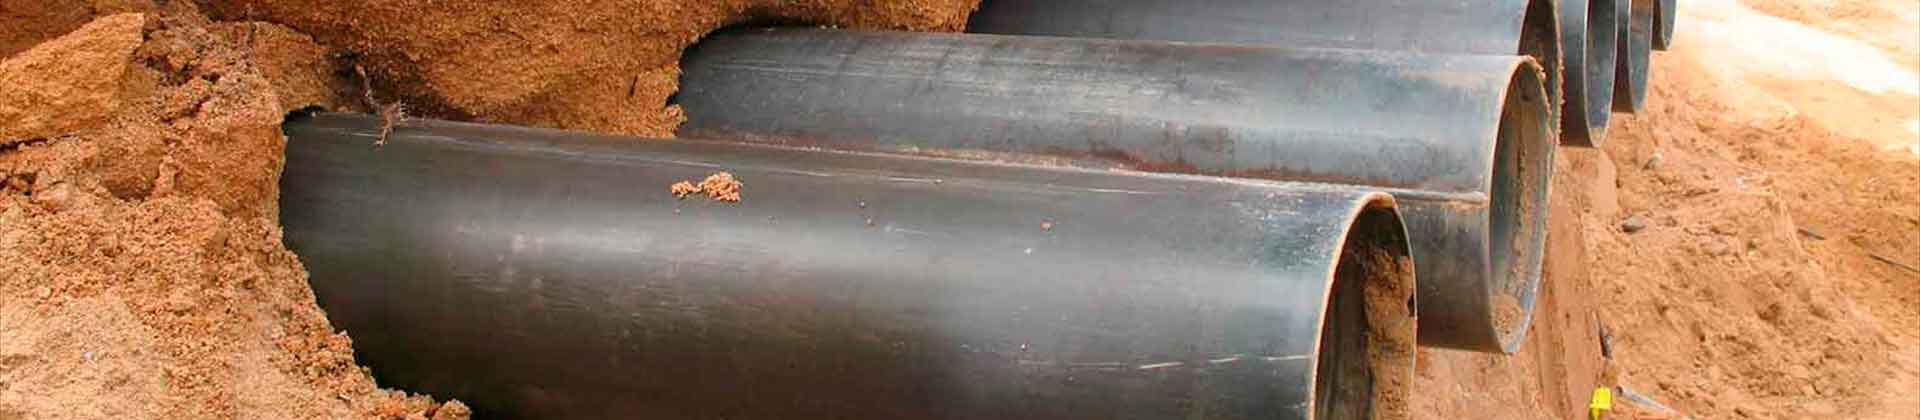 perforaciones horizontales vias